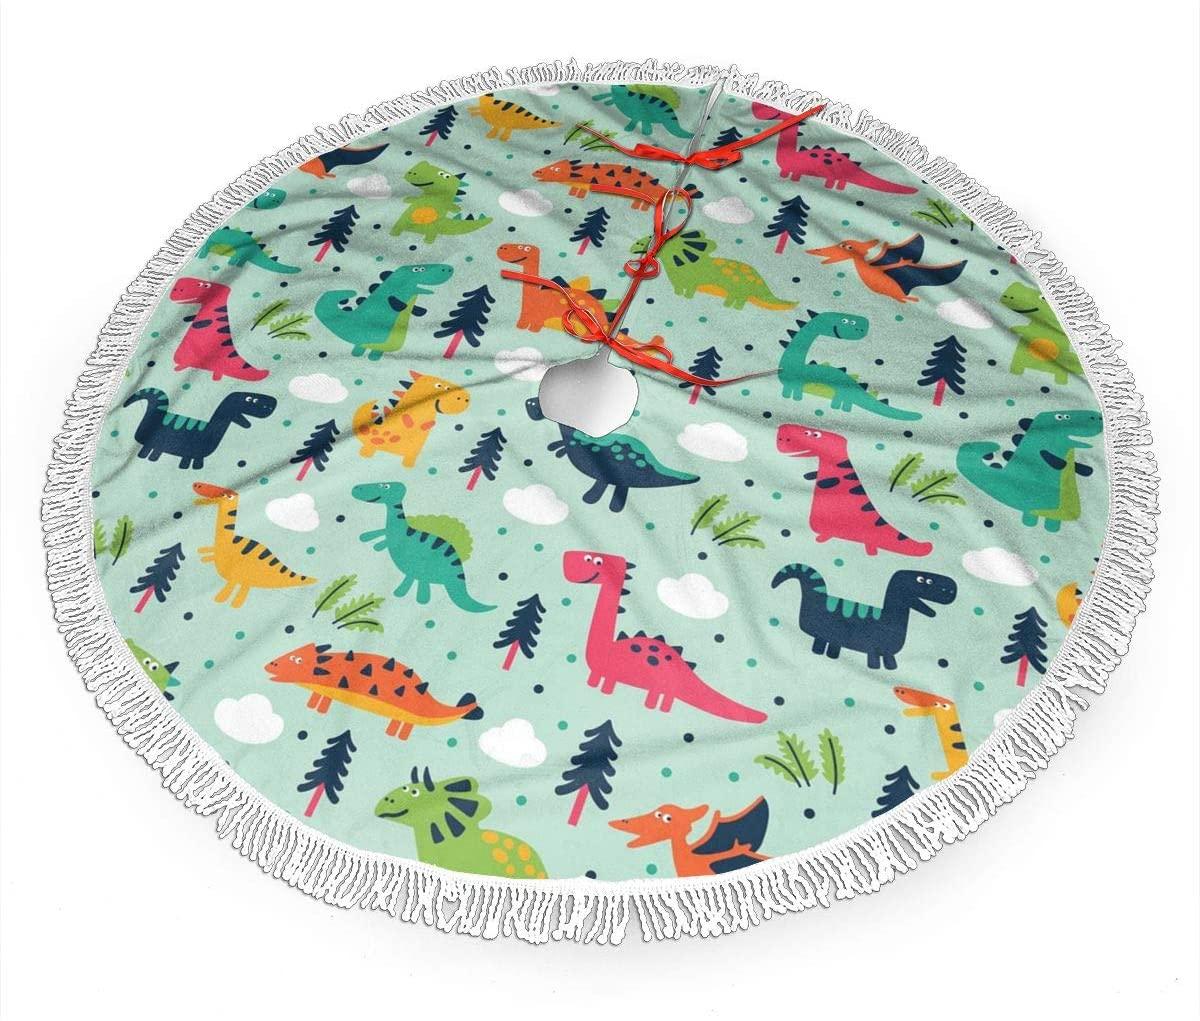 MSGUIDE Green Dinosaur Forest Christmas Tree Skirt 48